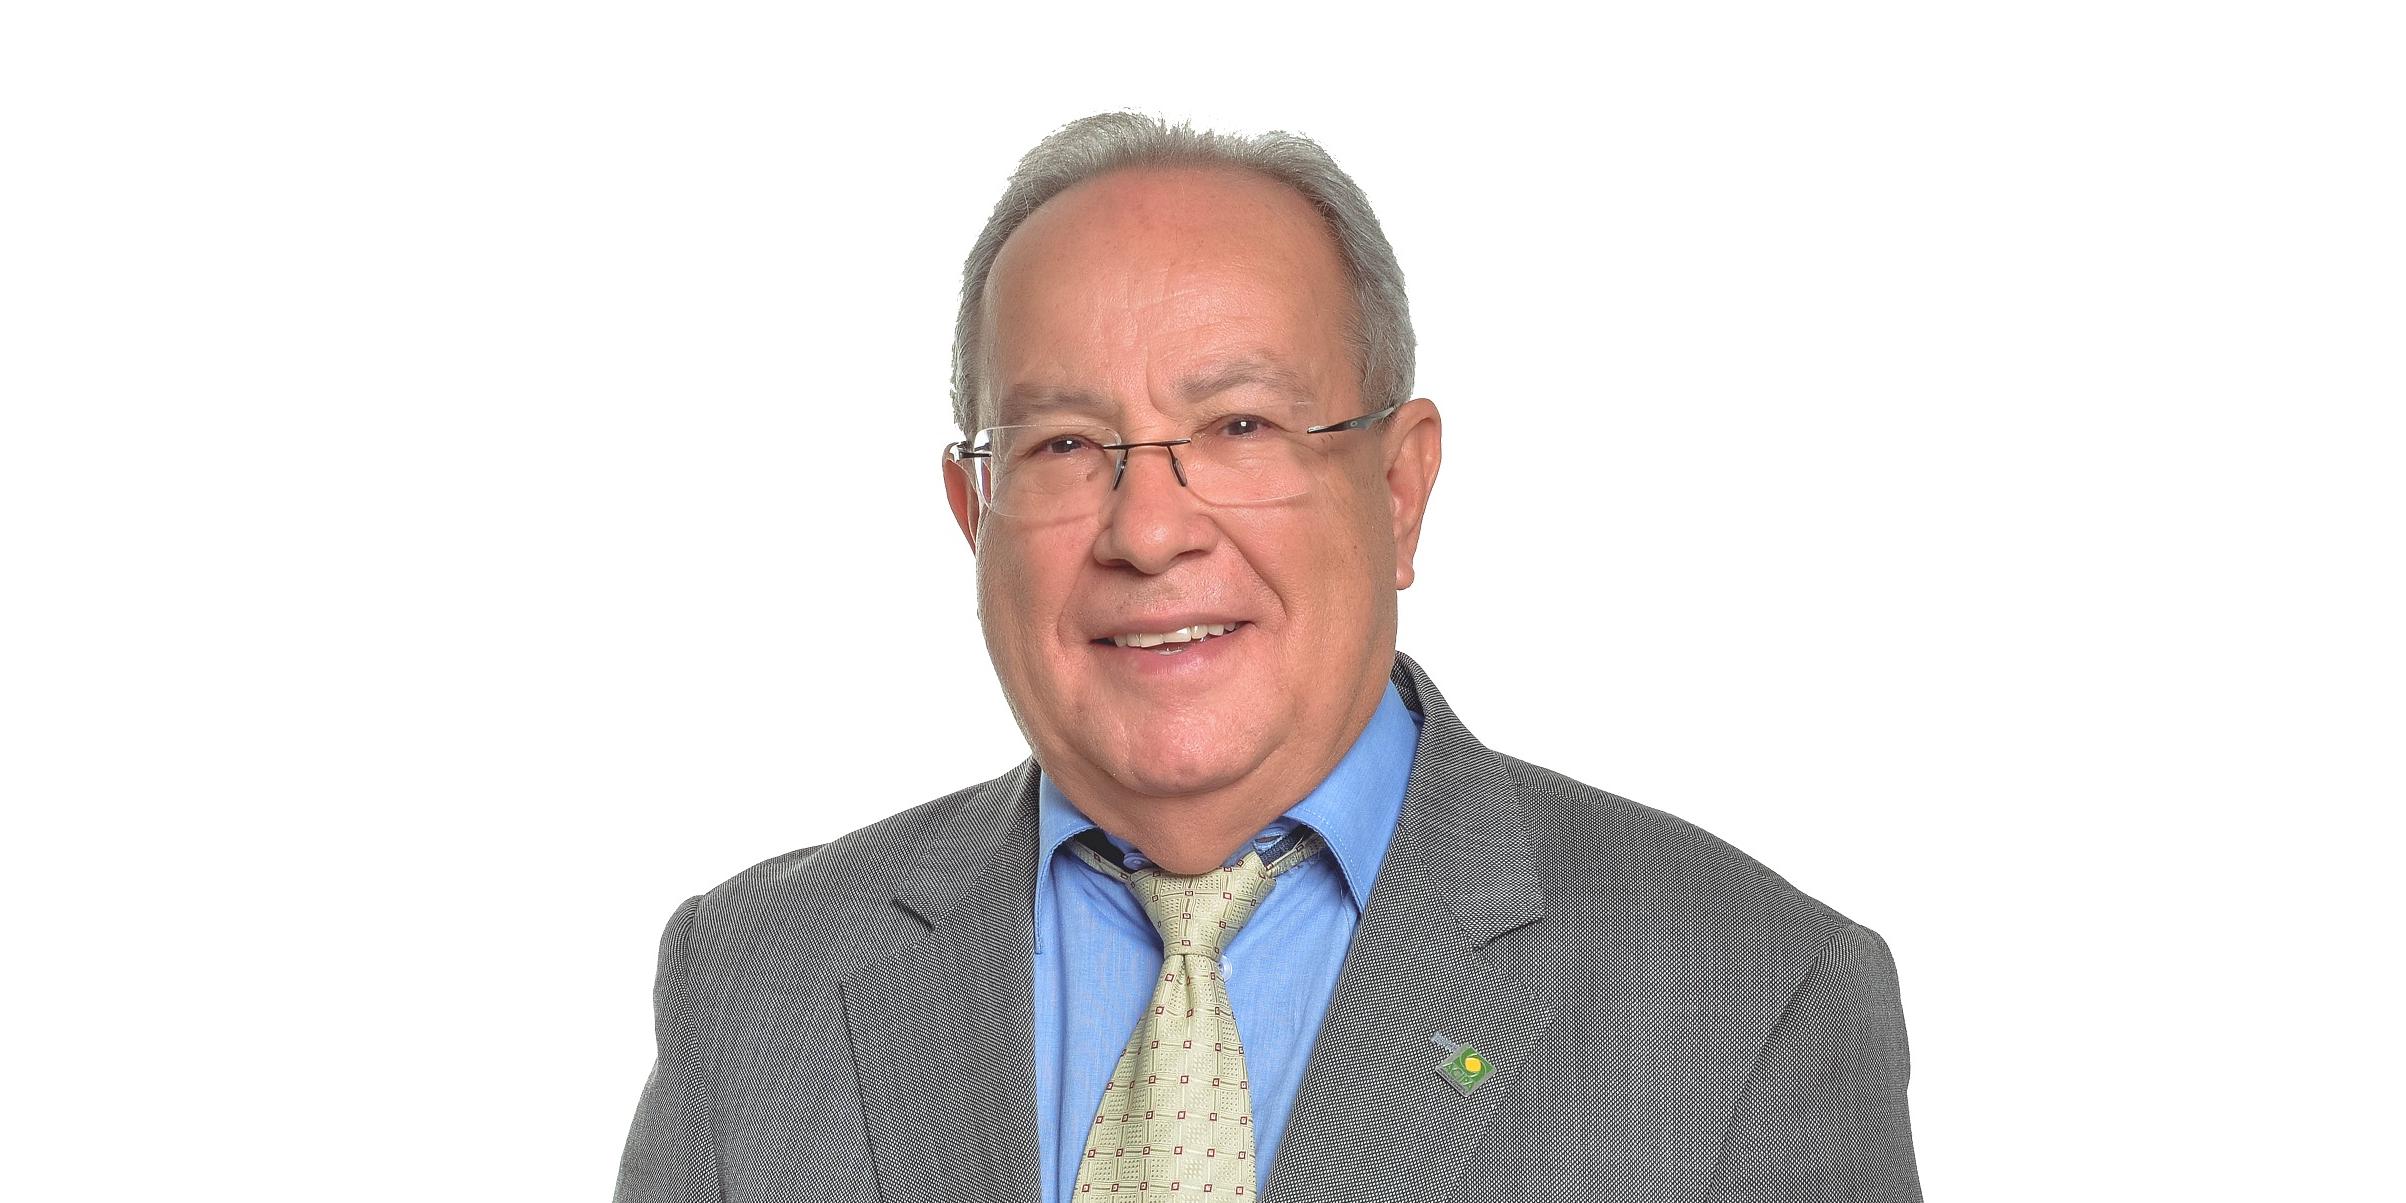 Antônio Davi Gouveia é eleito vice-presidente do CEETO